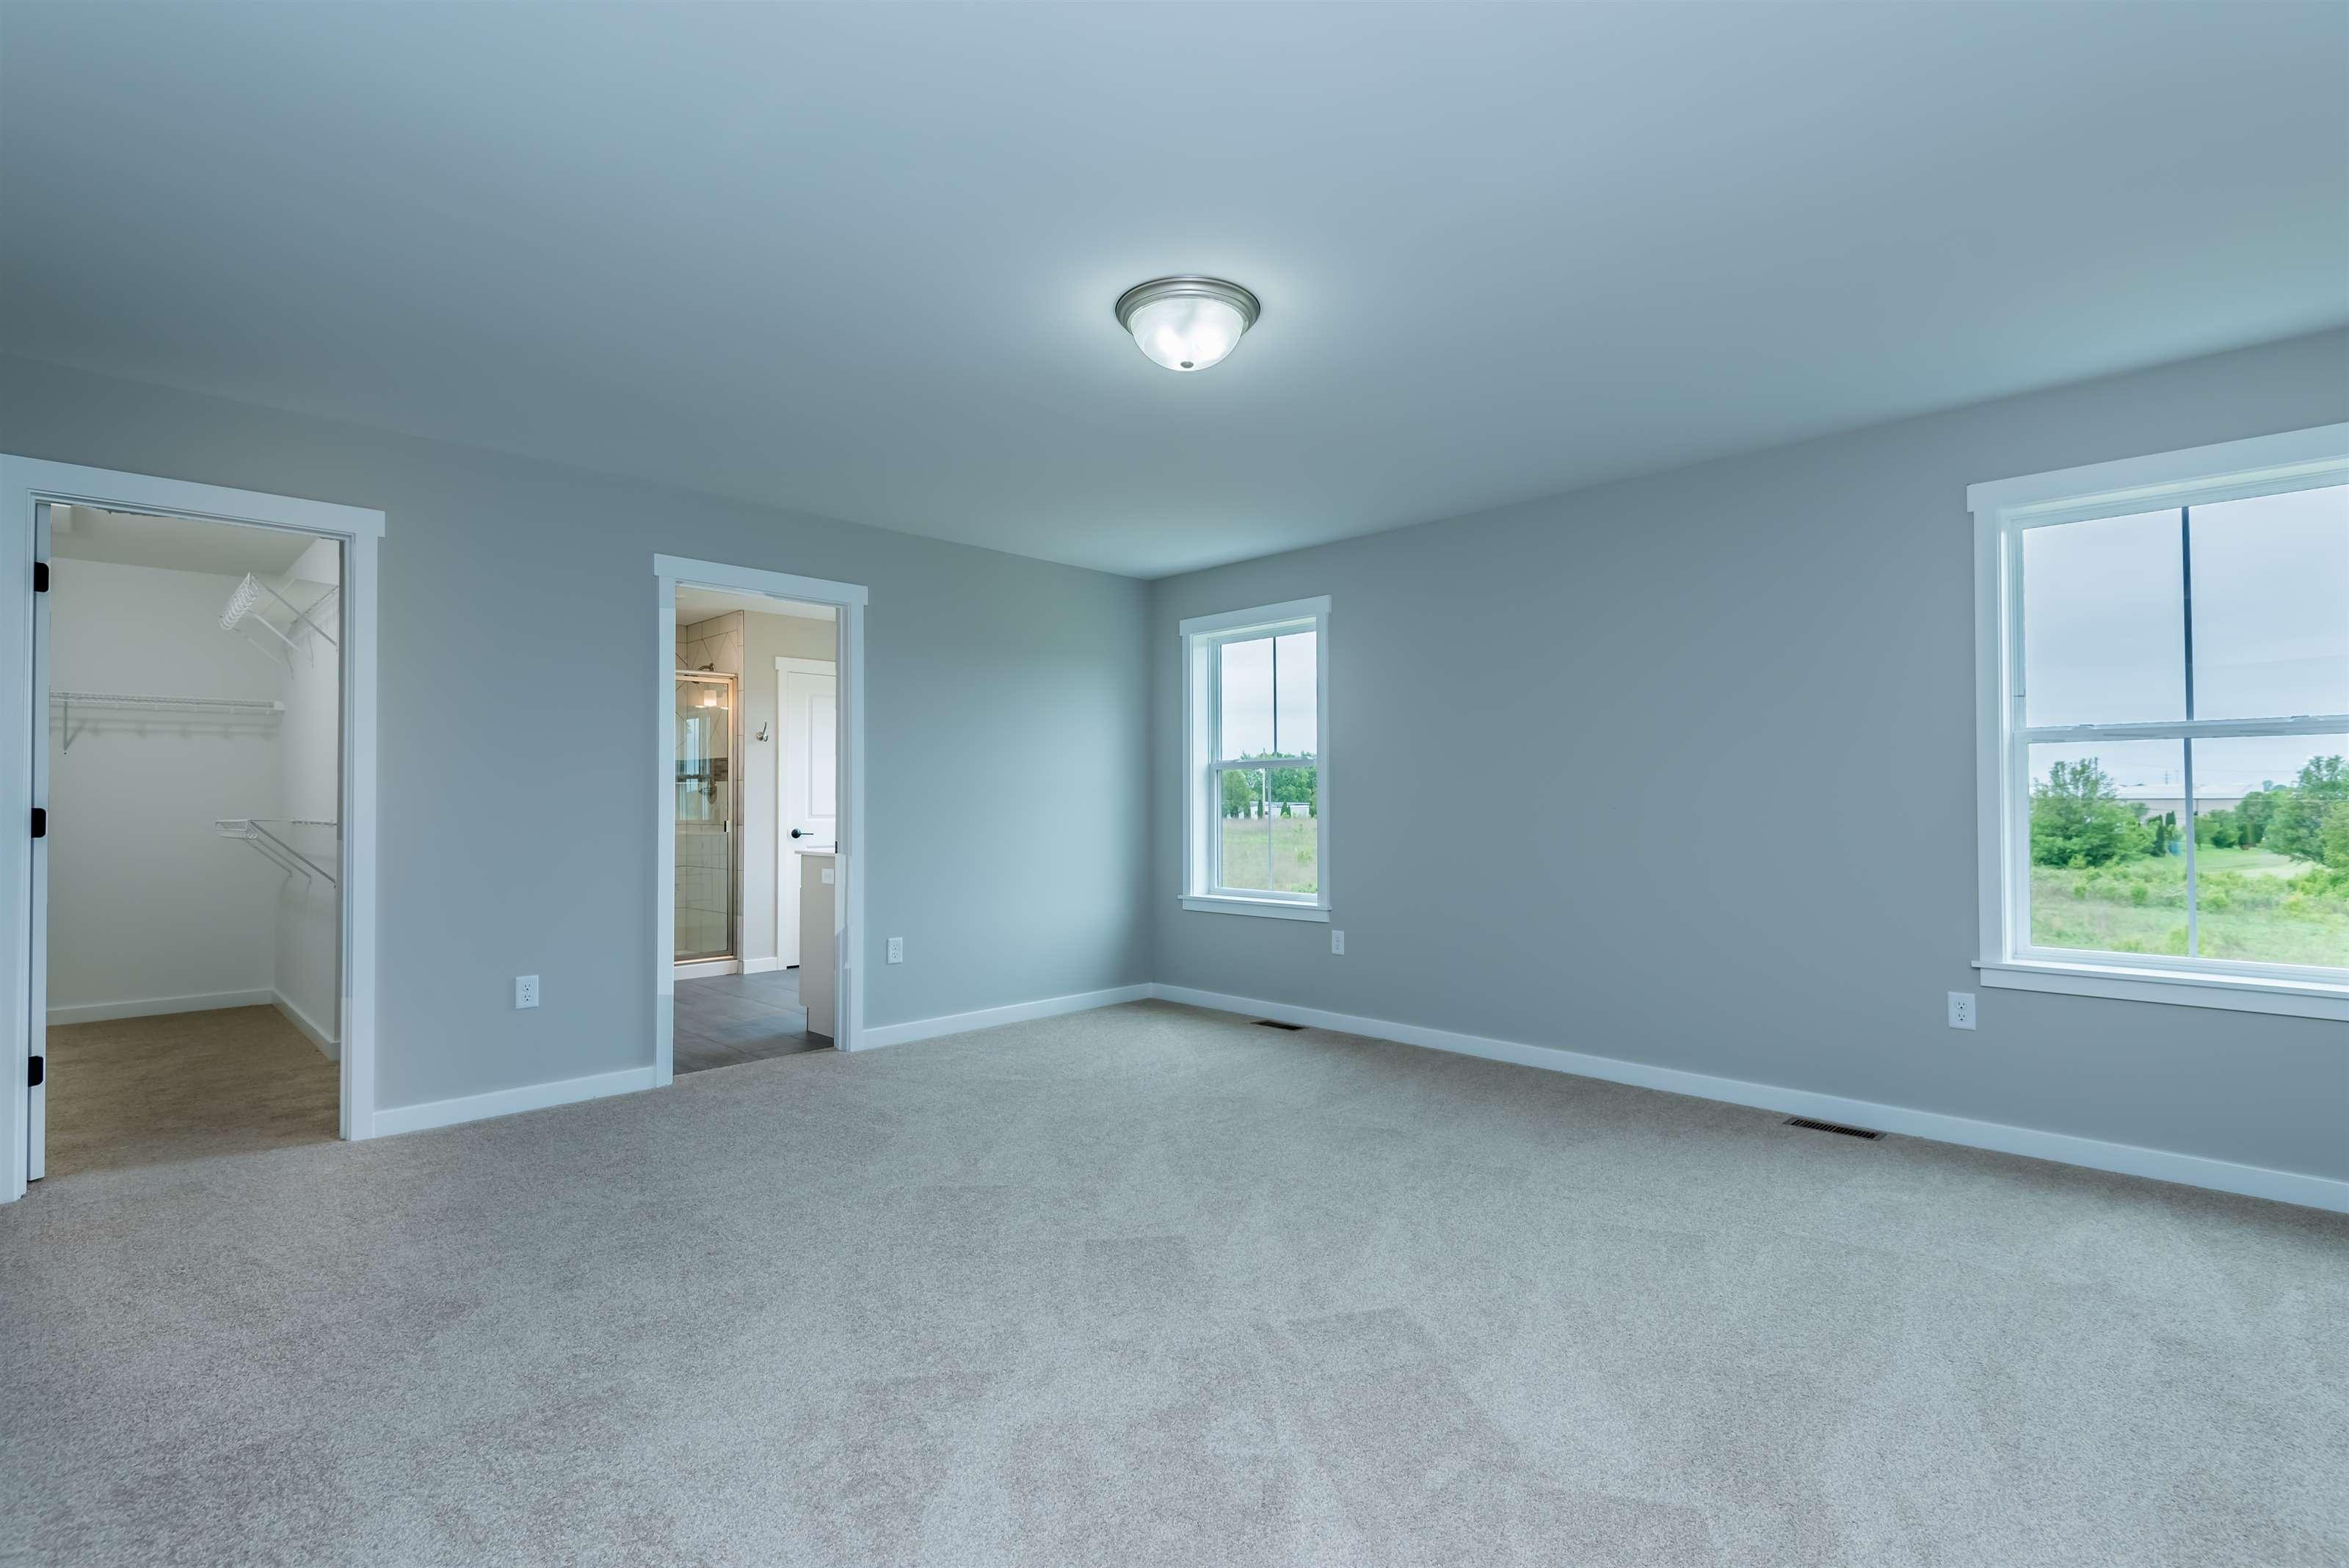 108 Steven Drive, Mechanicsburg, PA 17050